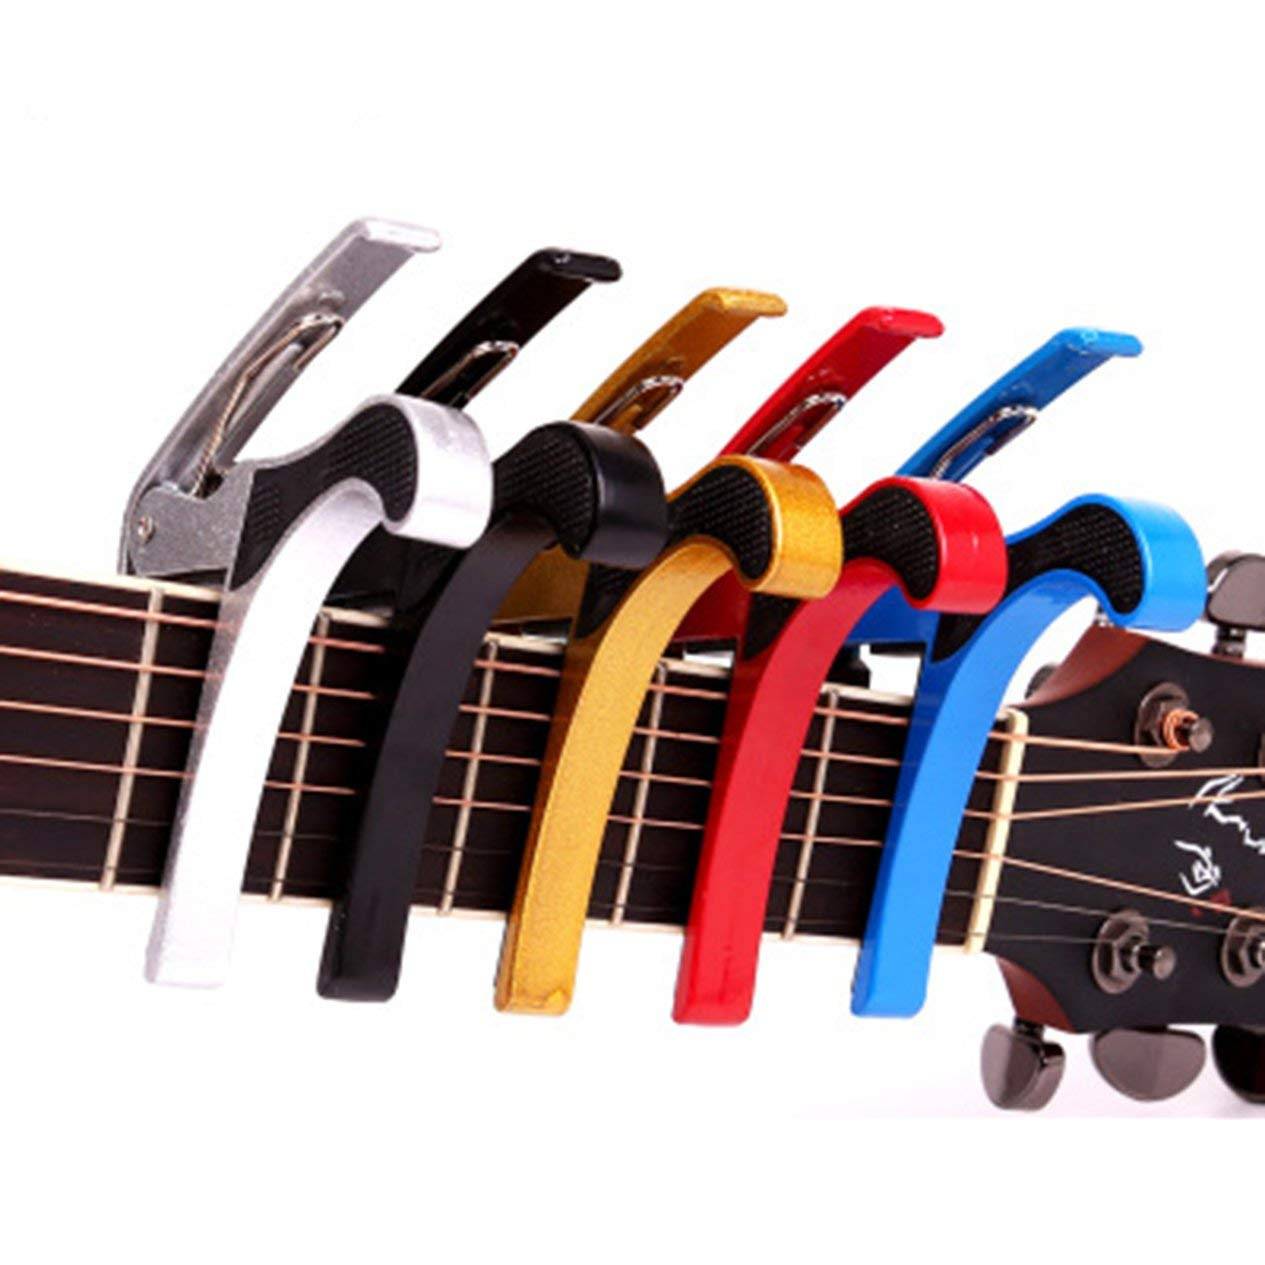 5 Colors Aluminium Alloy Capo Tuning Clutch-type Folder Ukulele Folk Guitar Ukulele Diacritical Clip Capo Guitar Tuner